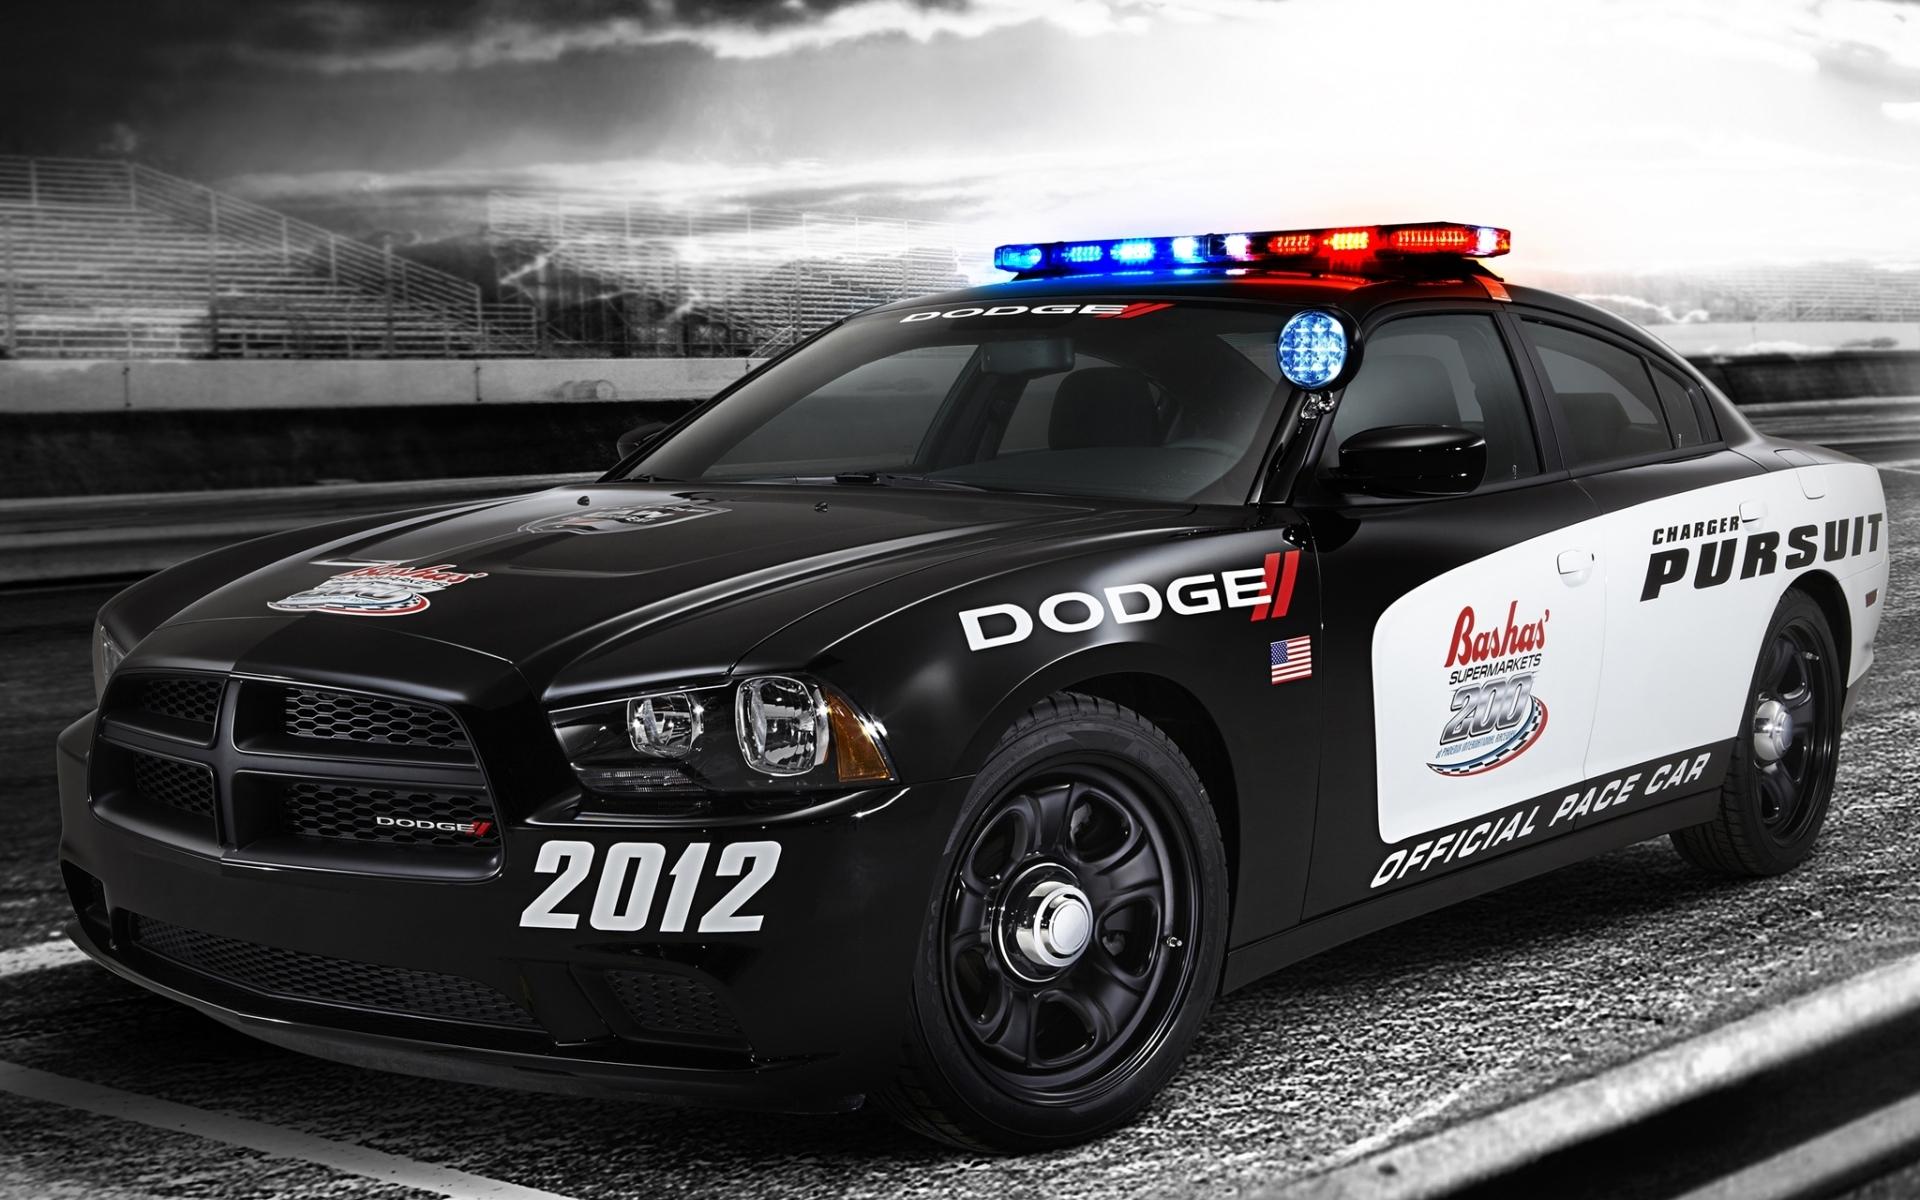 dodge charger pursuit wallpaper hd car wallpapers. Black Bedroom Furniture Sets. Home Design Ideas